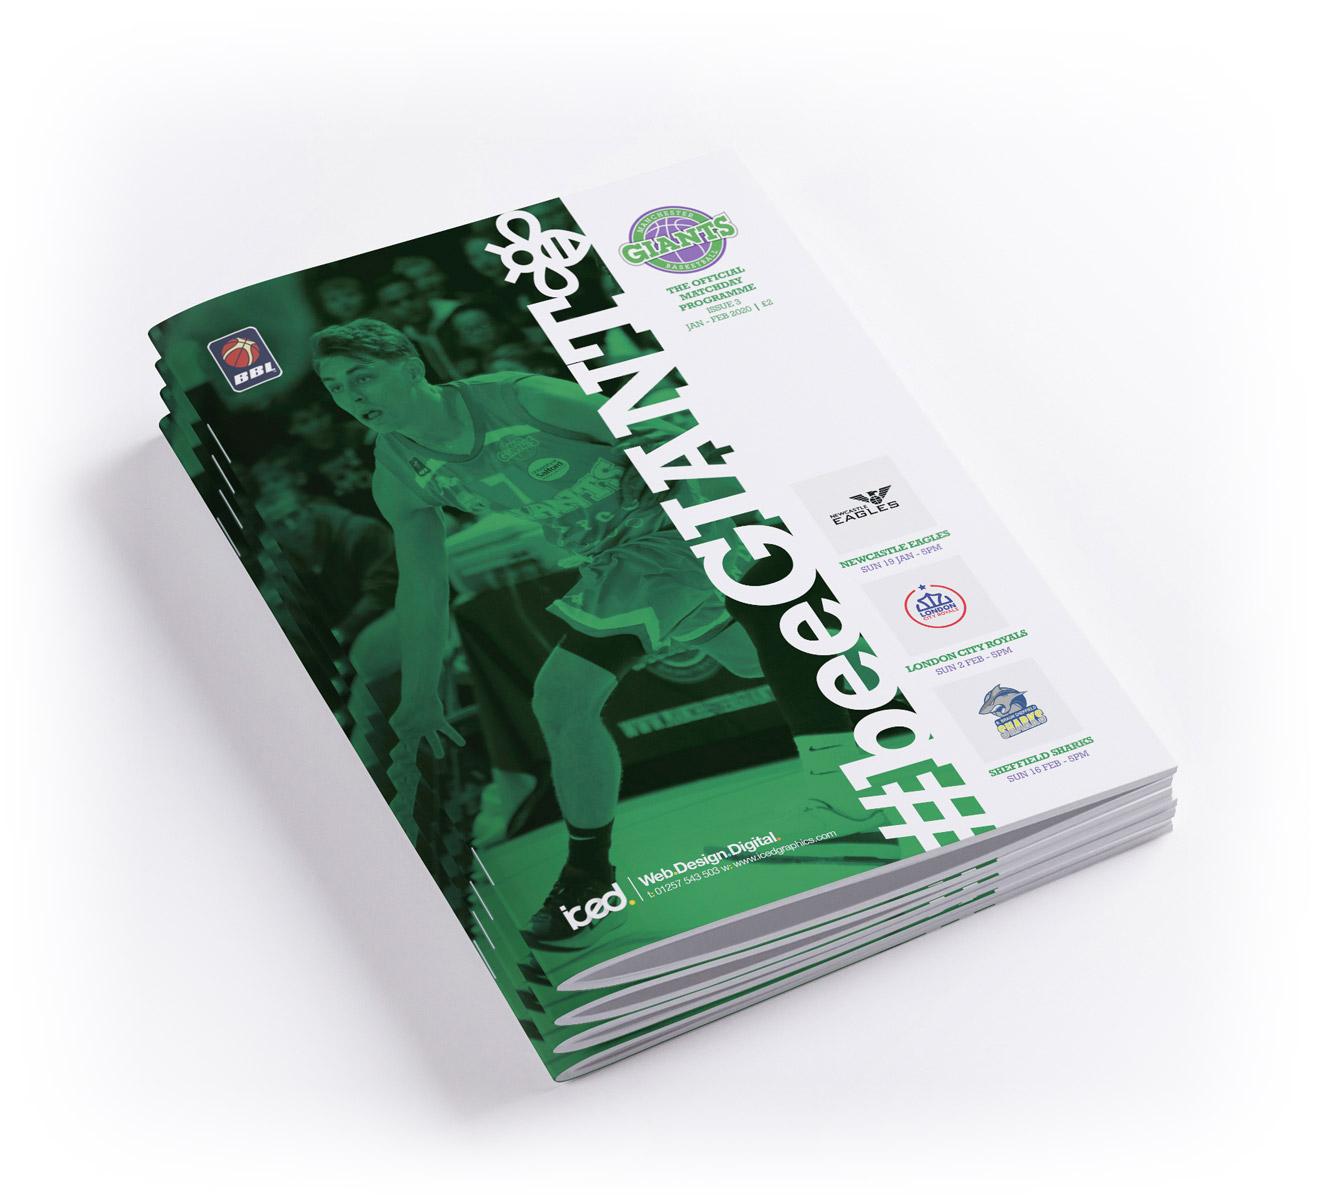 manchester giants programme design & print